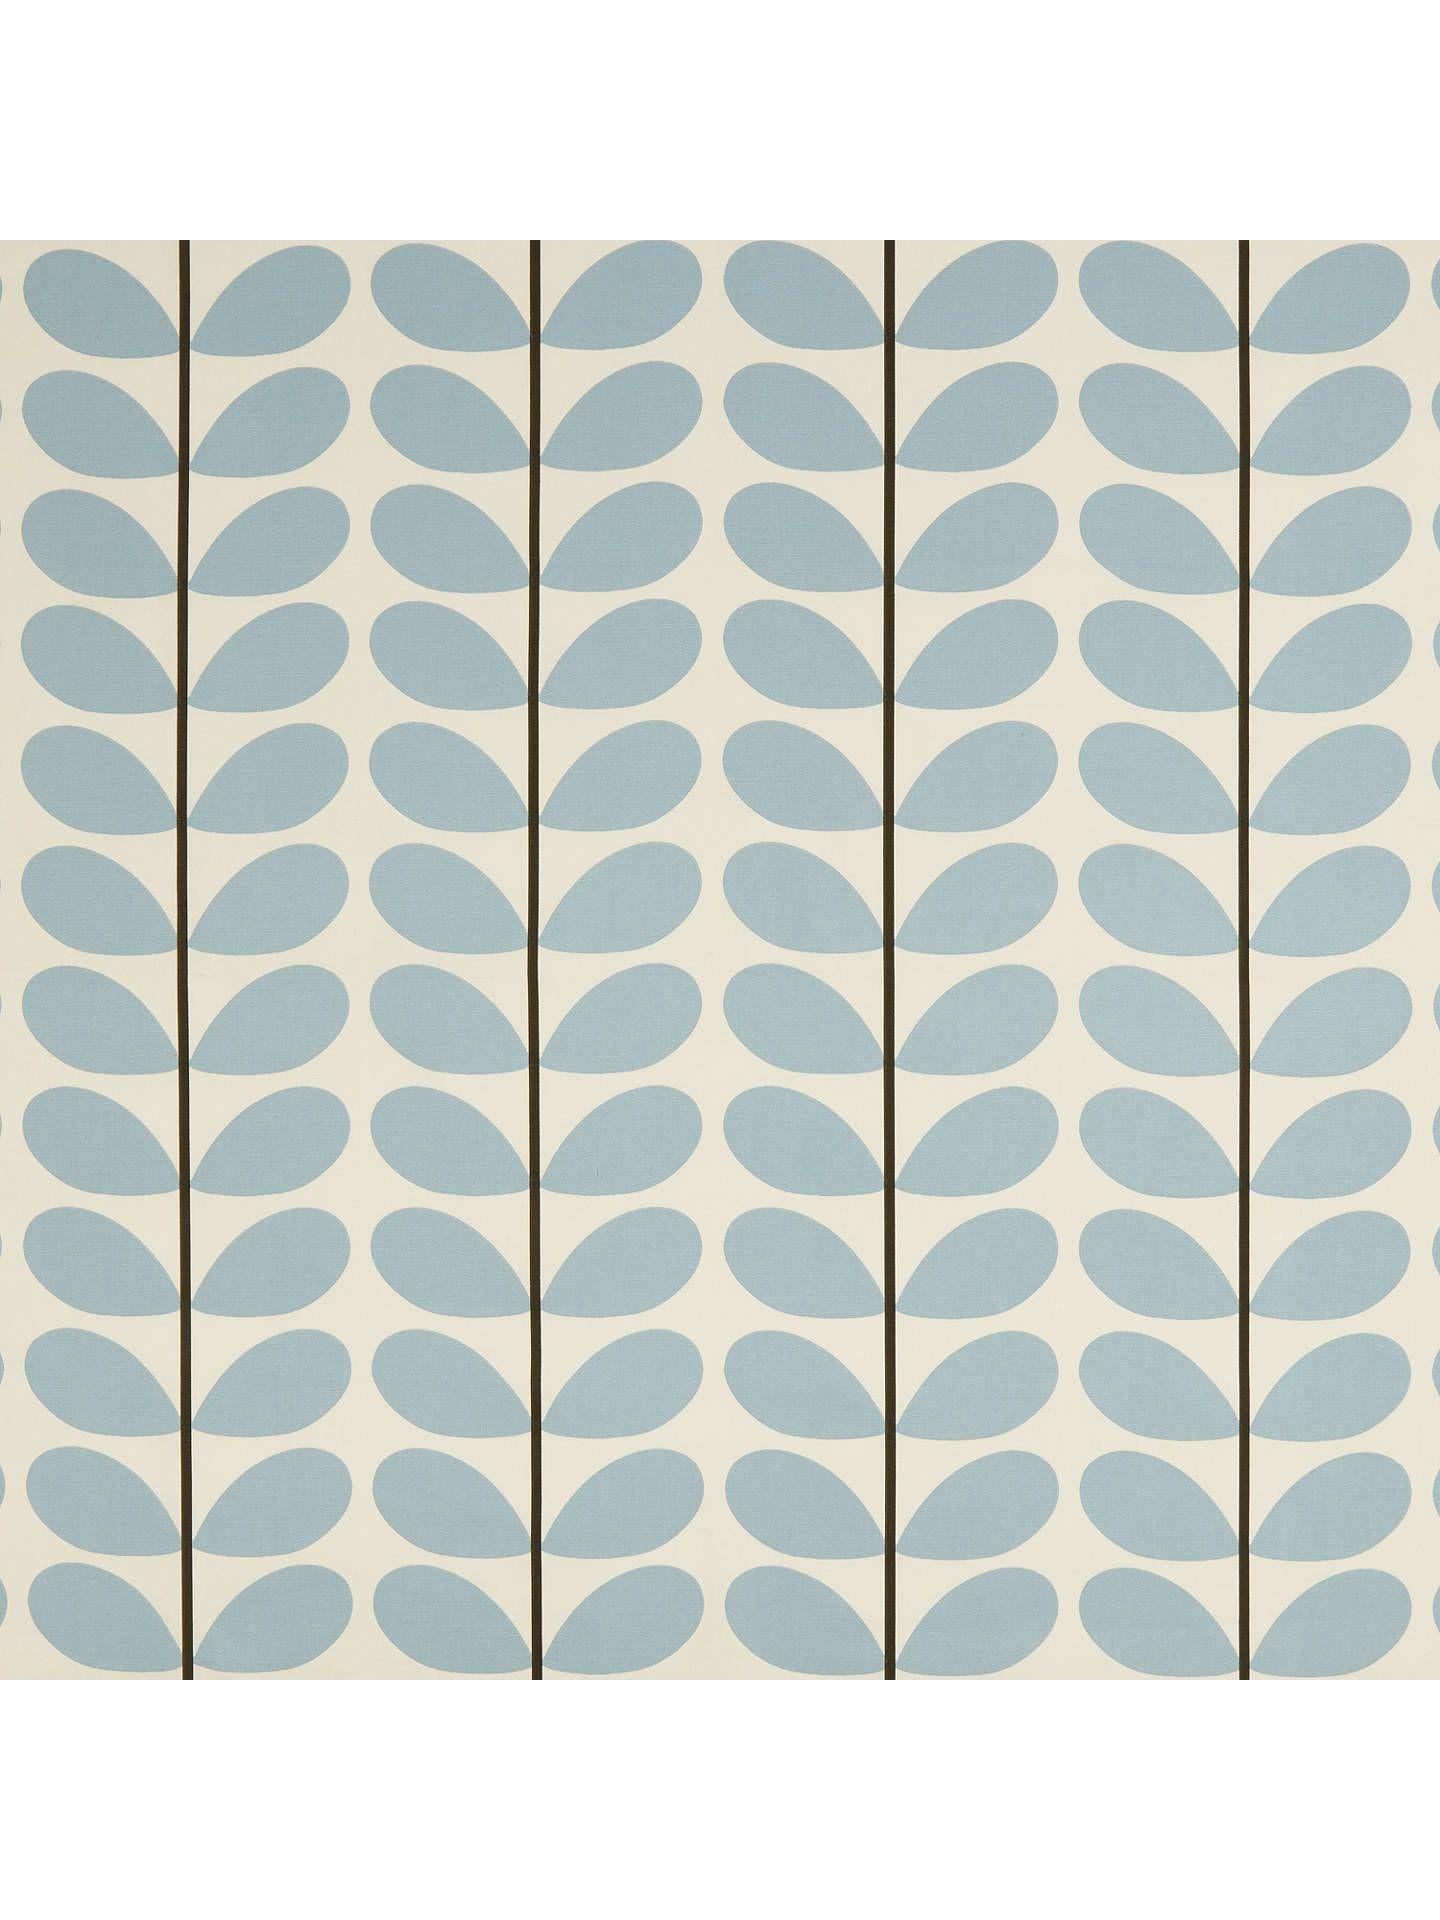 Orla Kiely Two Stem Furnishing Fabric, Grey Made to